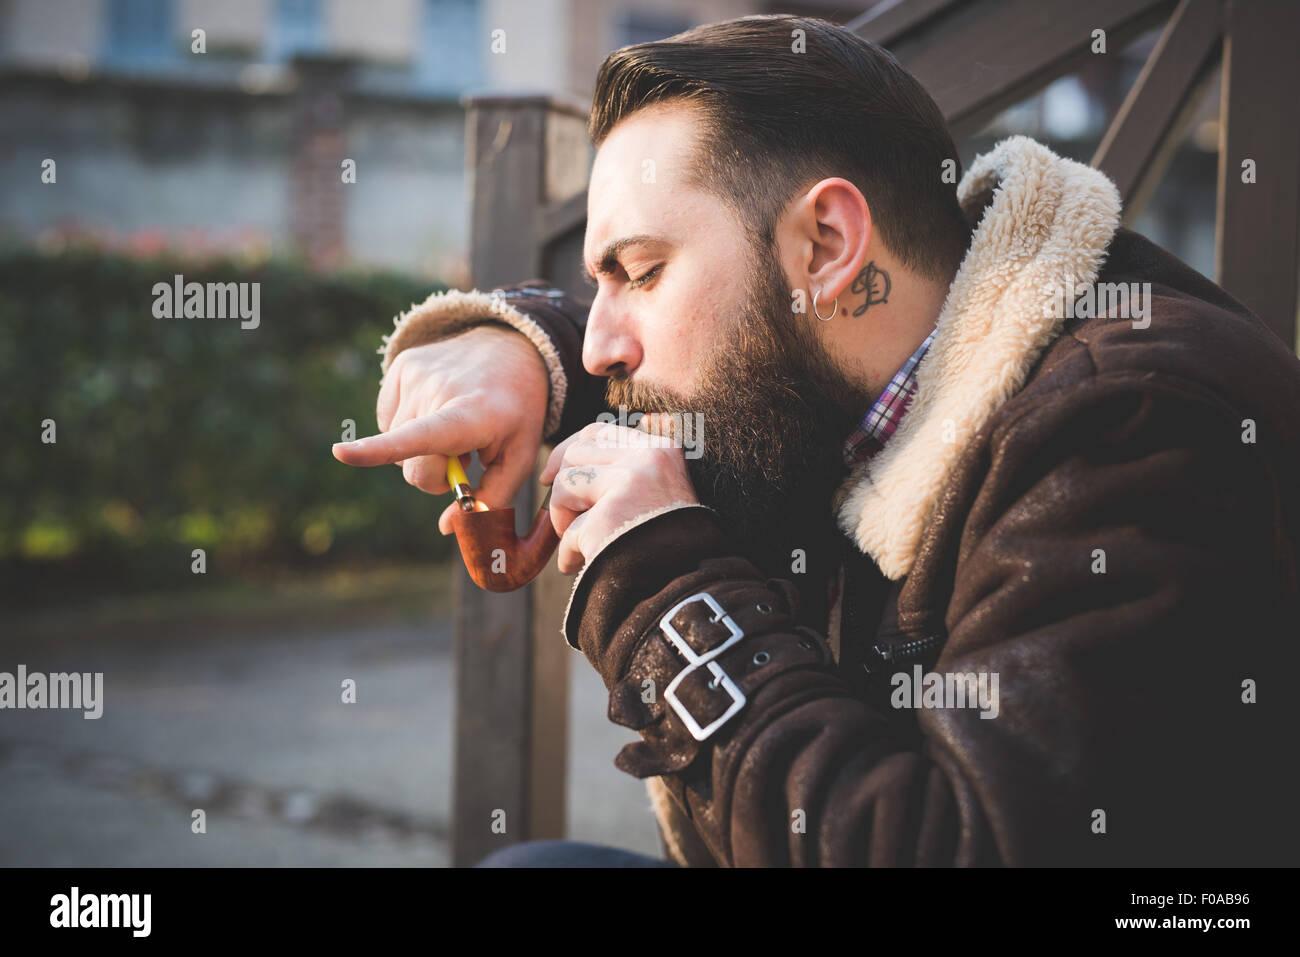 Joven barbudo hombre pipa en pasos Imagen De Stock